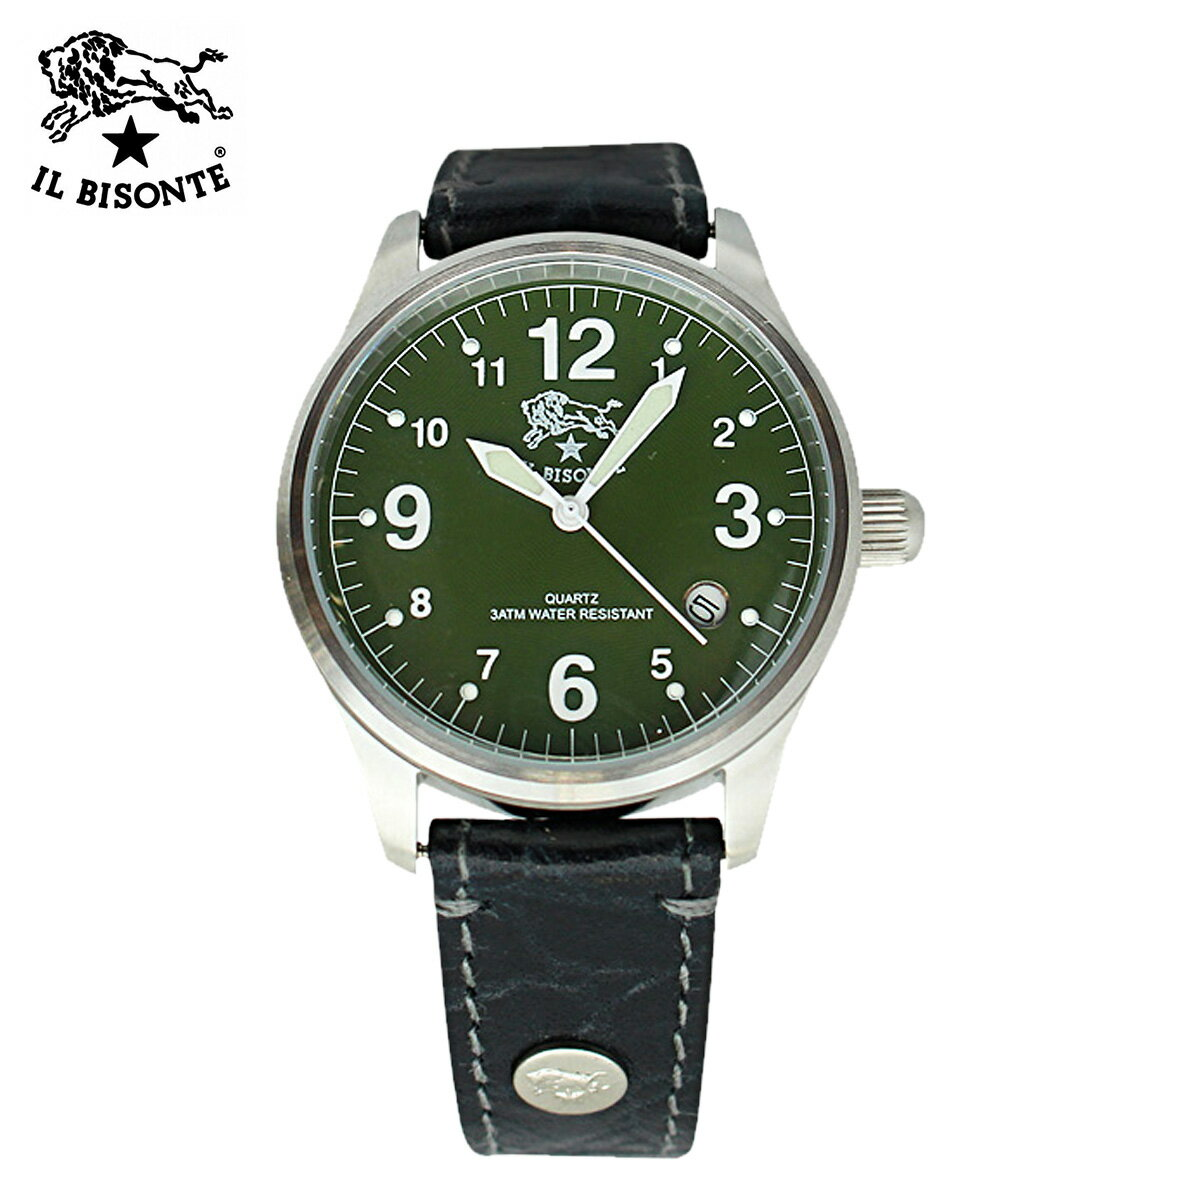 IL BISONTE イルビゾンテ 腕時計 ウォッチ  H0502-VS-542N ブラック WATCH  メンズ レディース [ 対象外 ]  送料無料  IL BISONTE イルビゾンテ 時計 ウォッチ 正規 通販